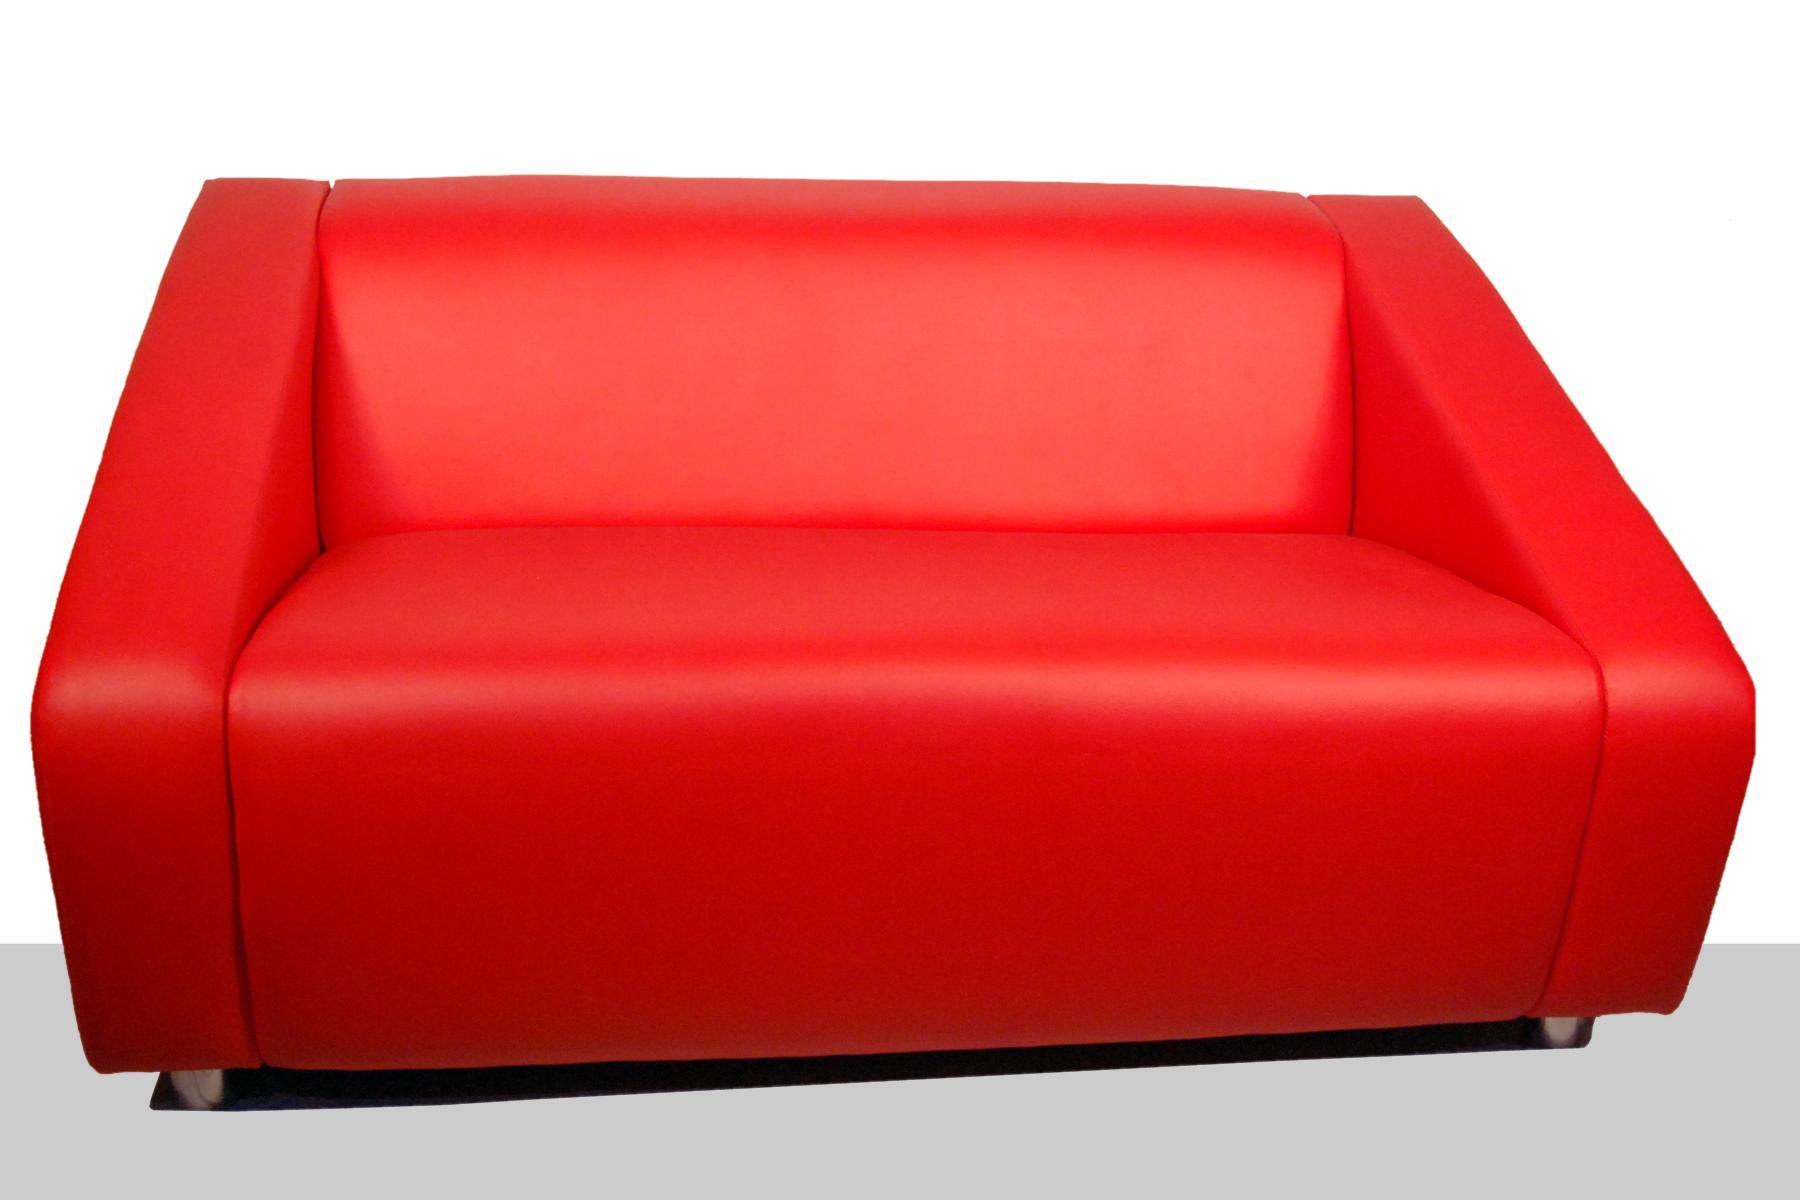 Korean style Red Sofa